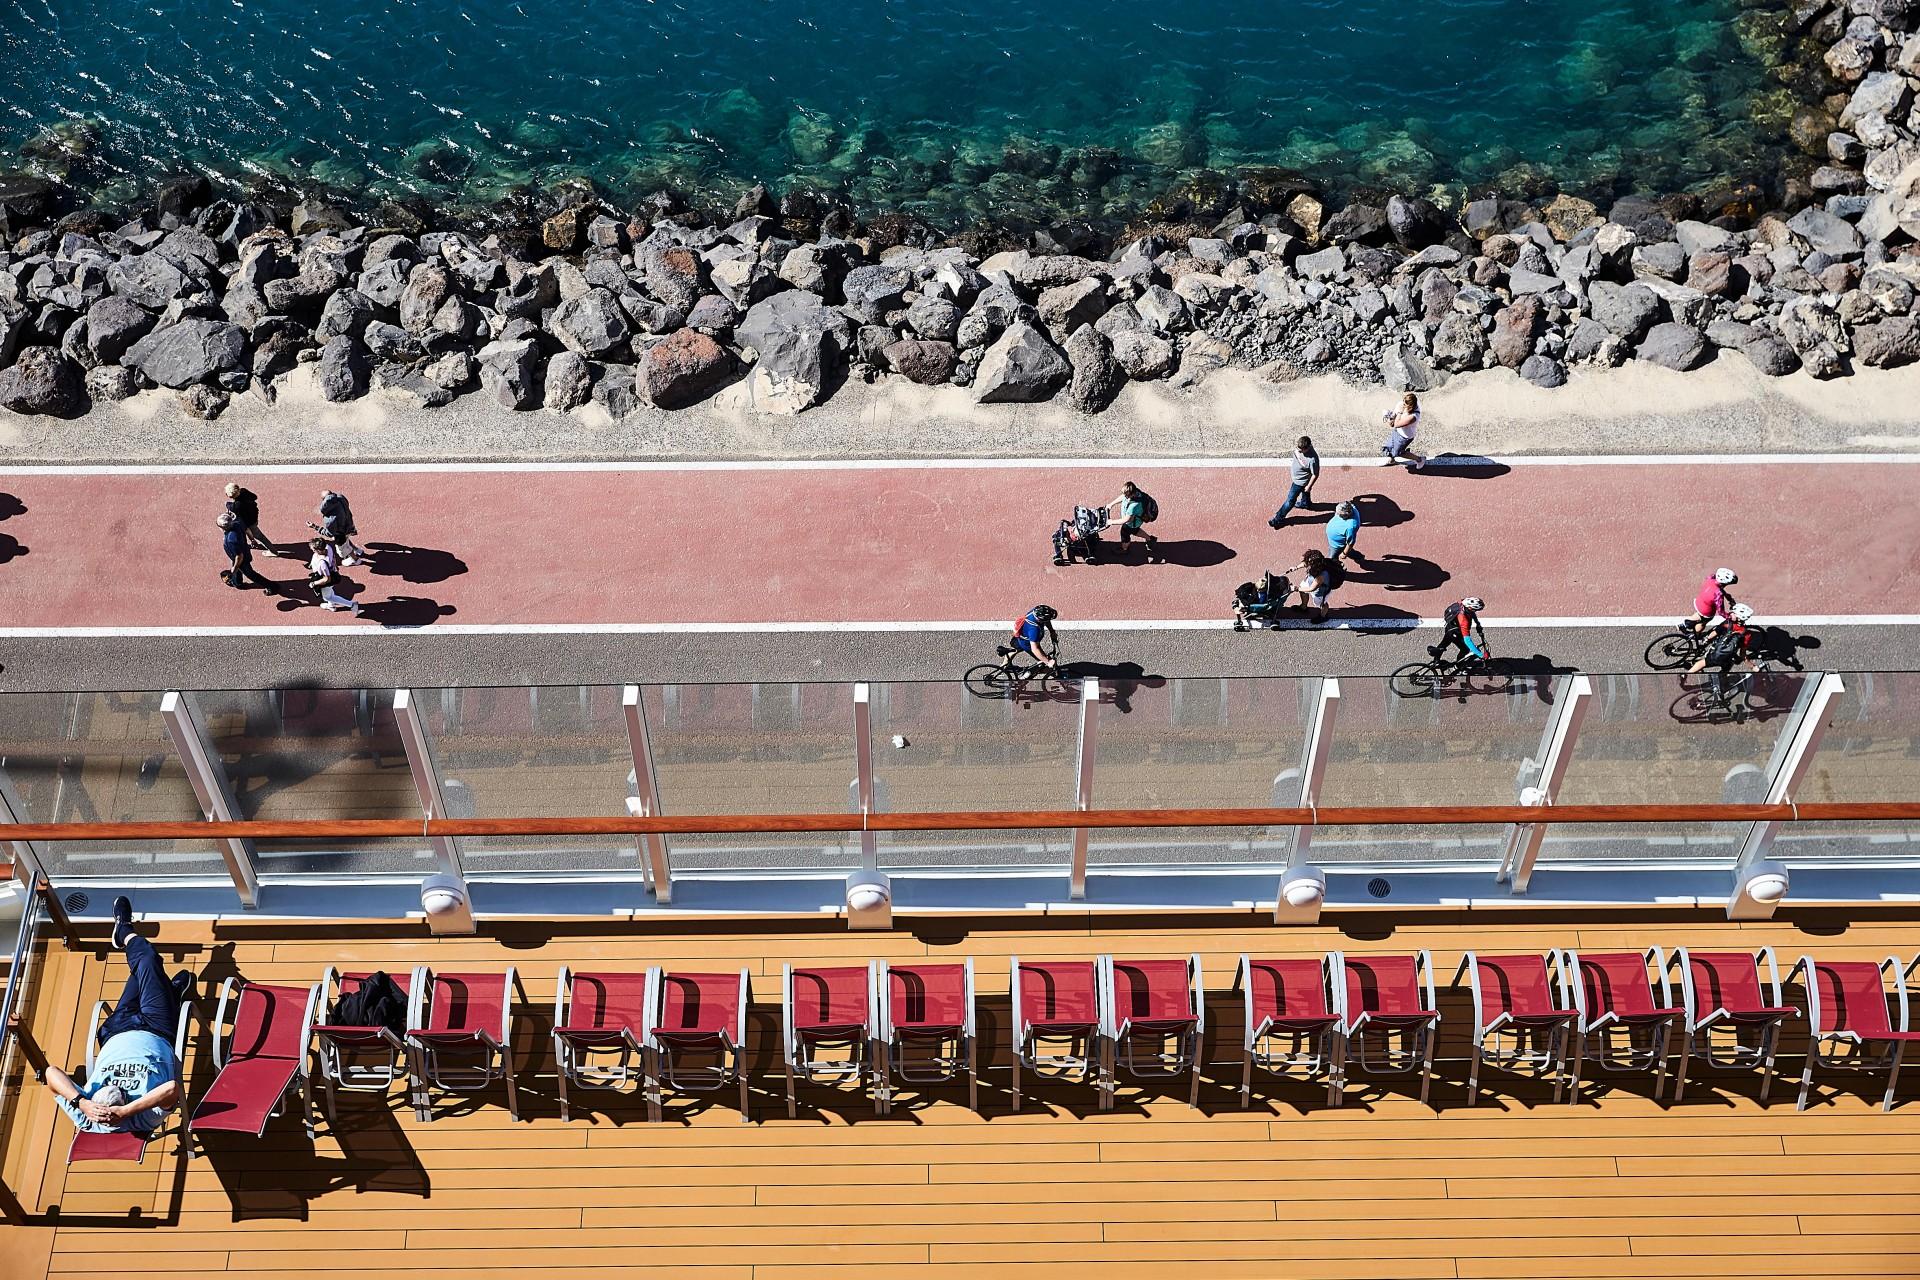 CAROLIN WINDEL Kreuzfahrt – Kann man so noch Urlaub machen?, STERN (more-click here)